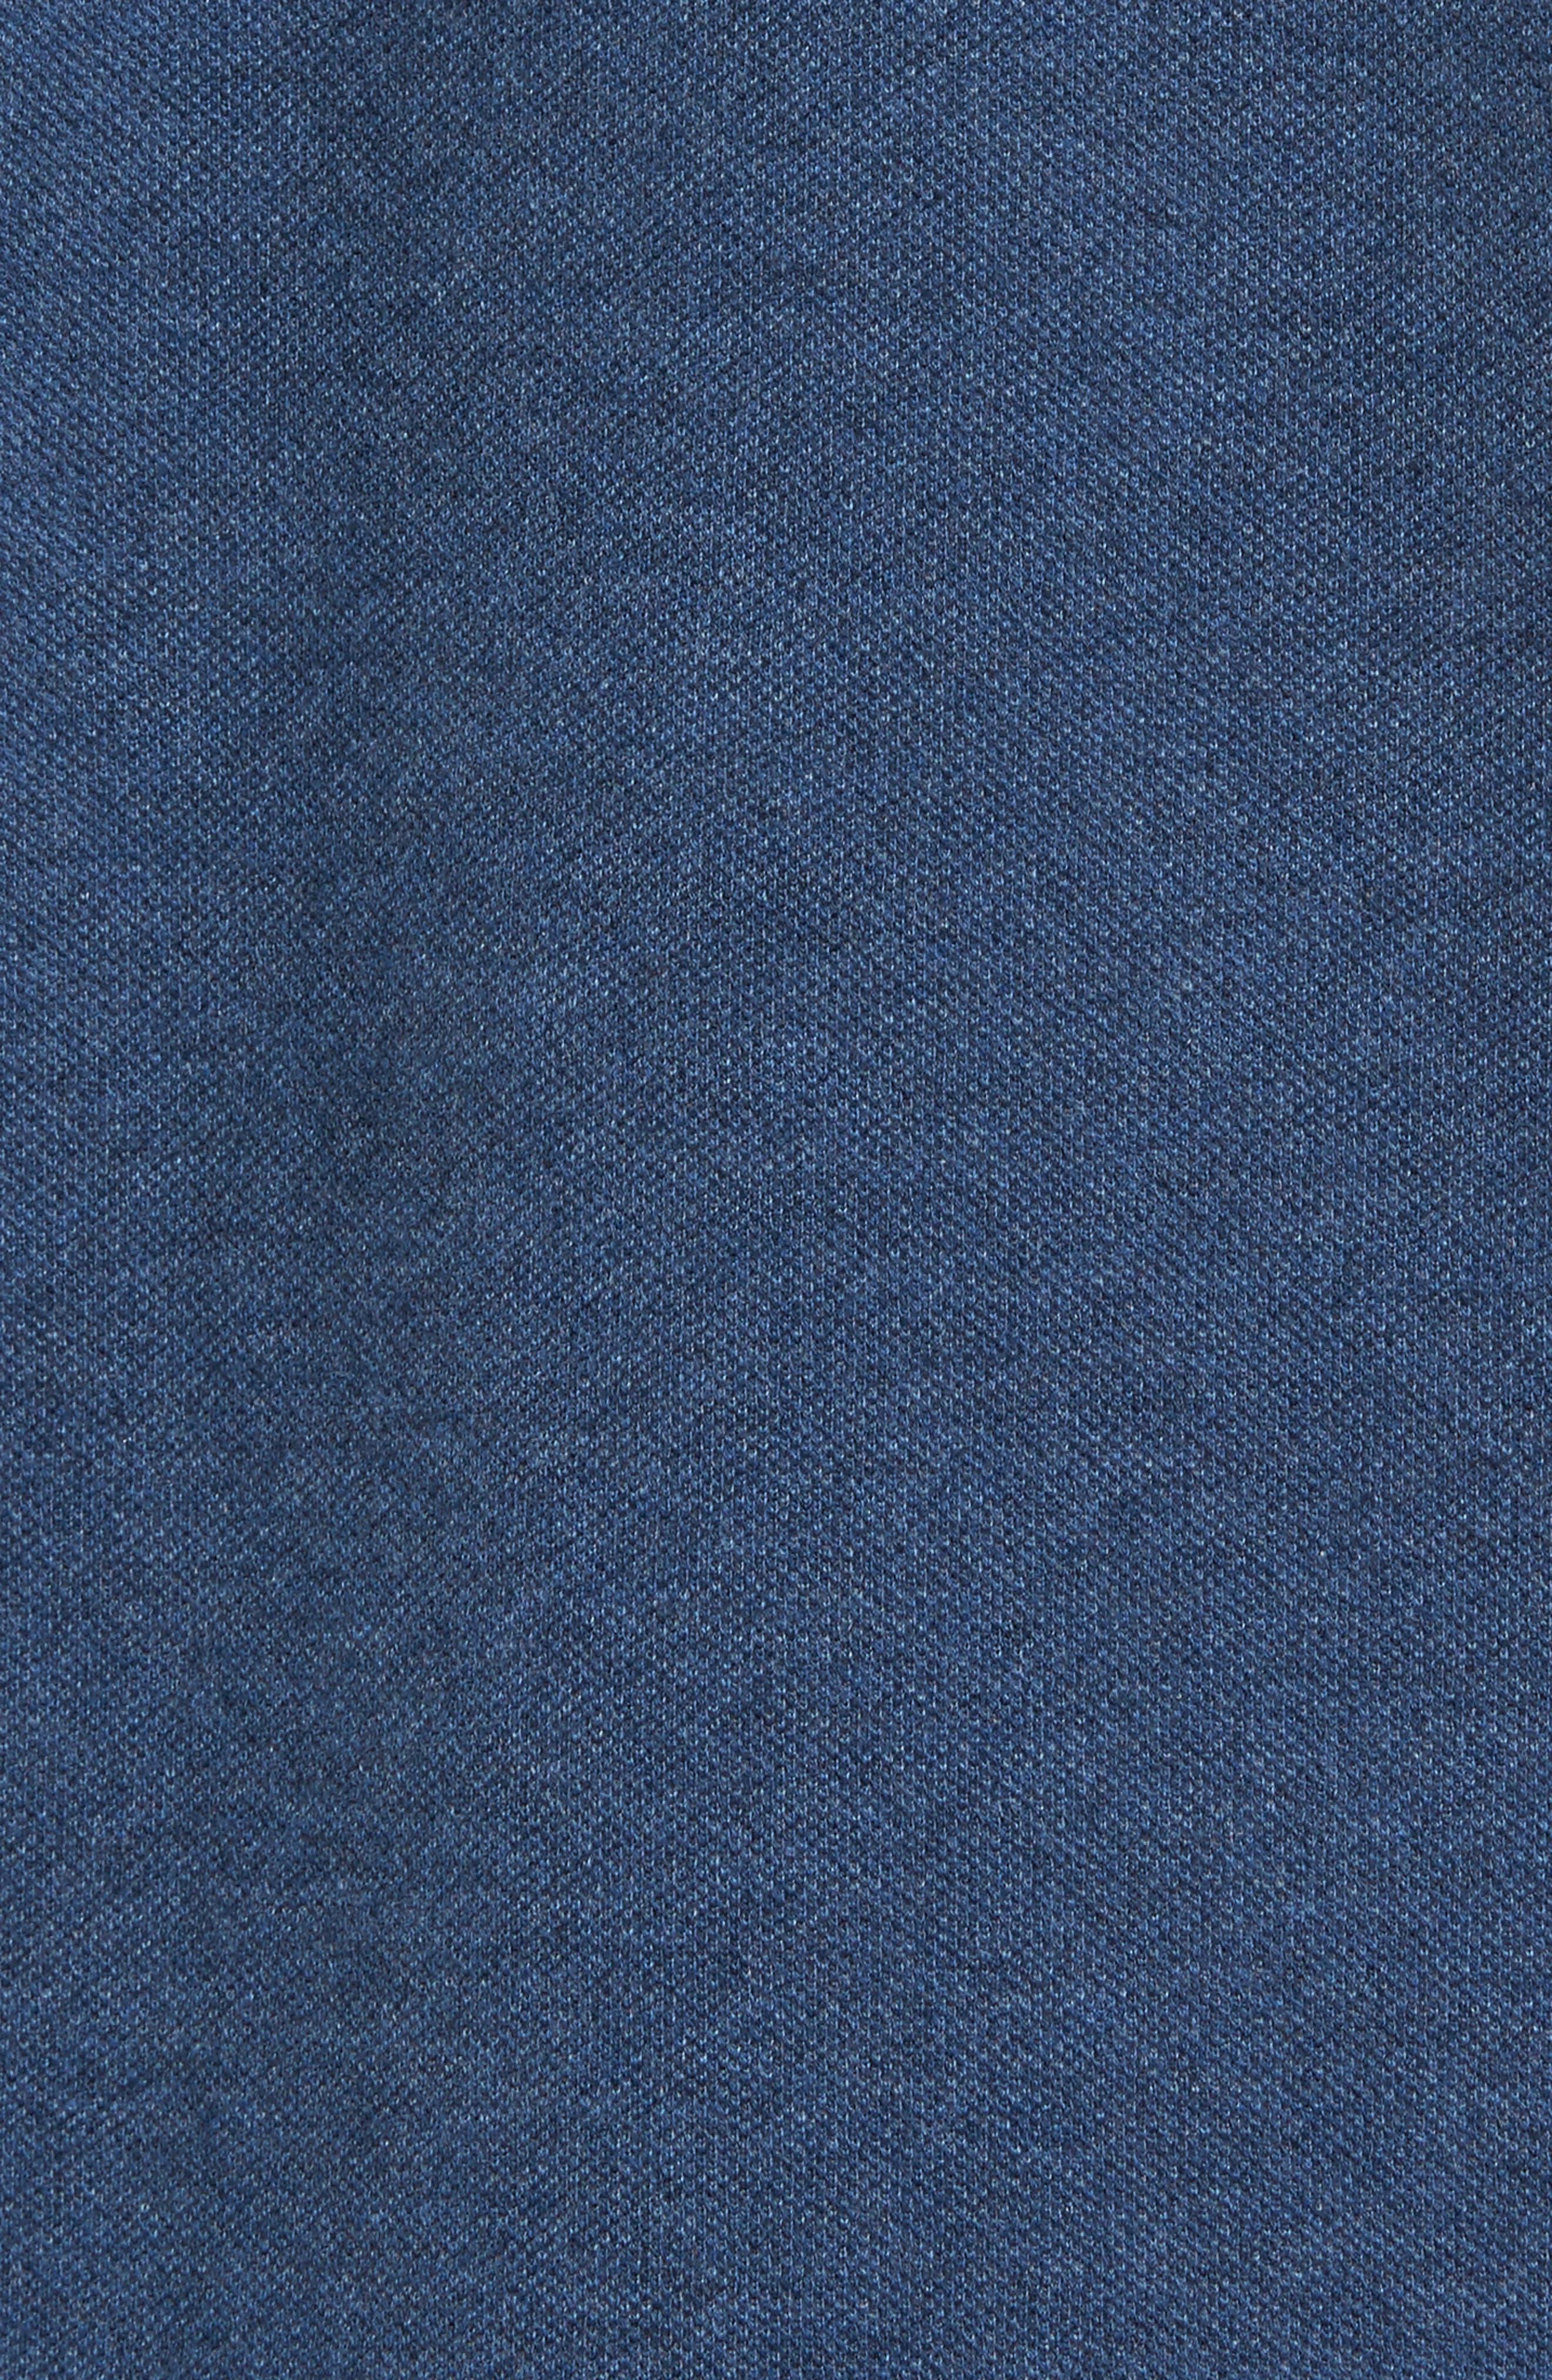 Shandy Heathered Knit Sport Shirt,                             Alternate thumbnail 10, color,